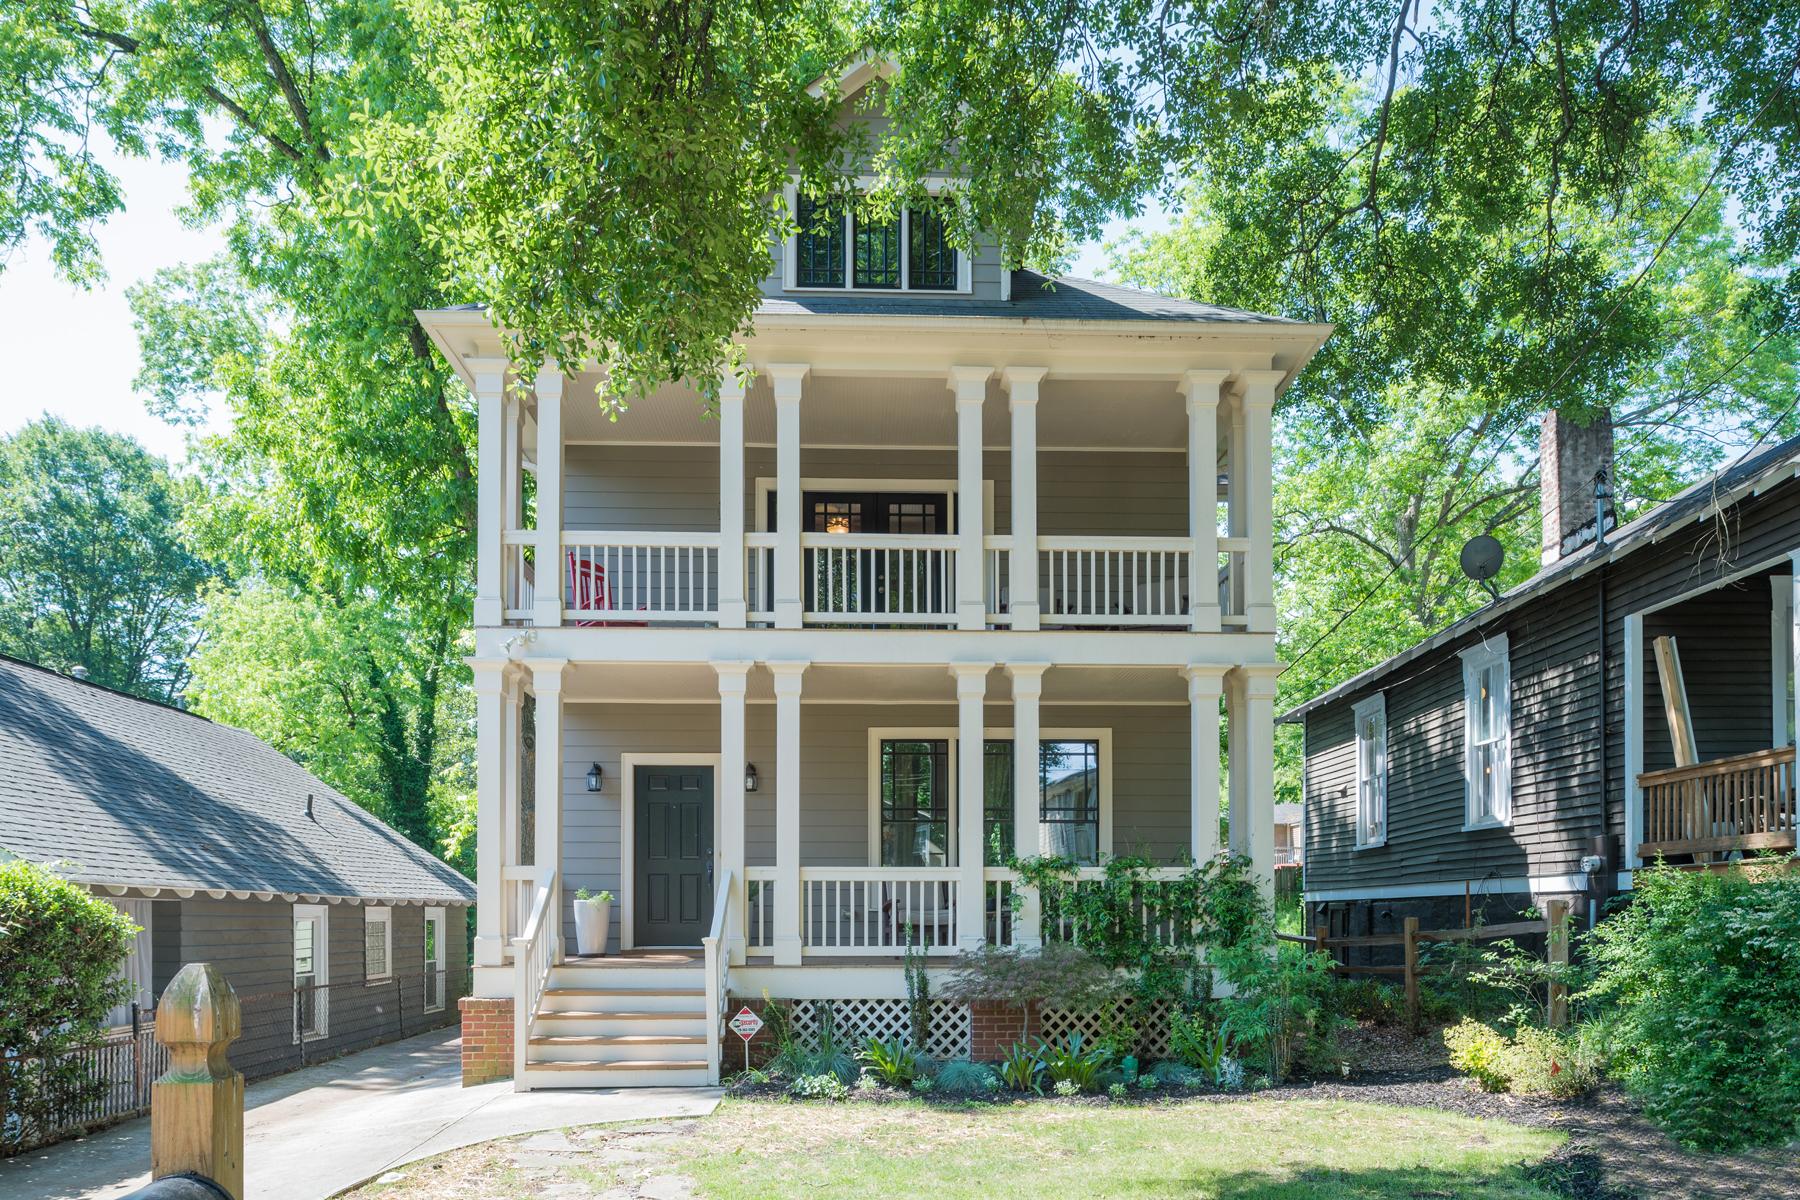 独户住宅 为 销售 在 Charleston-Style In Edgewood 1219 Mortimer Place SE Edgewood, 亚特兰大, 乔治亚州, 30317 美国